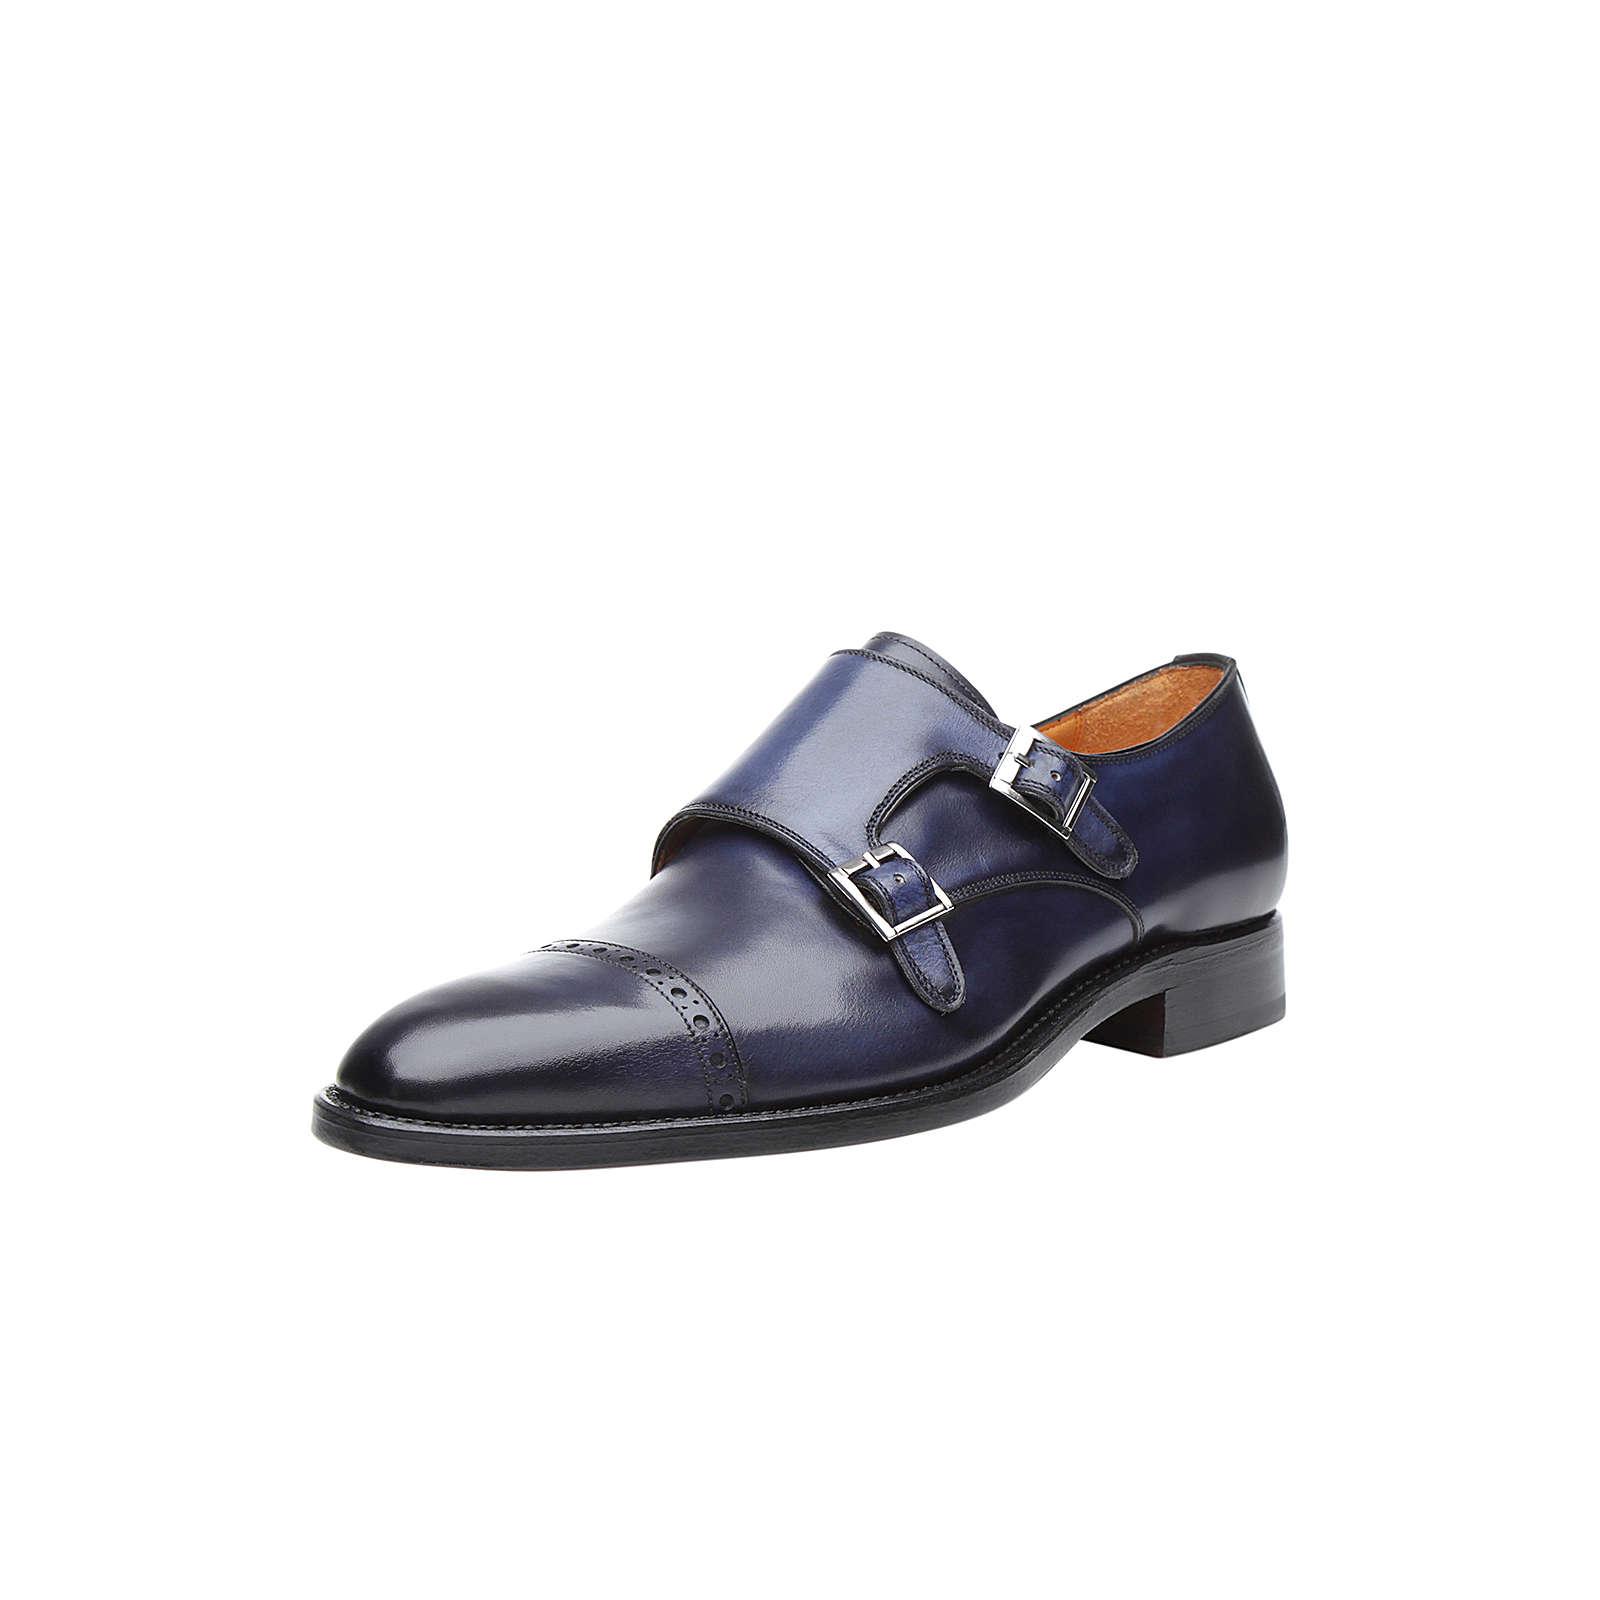 Shoepassion Halbschuhe No. 5422 Business-Schnürschuhe blau Herren Gr. 46